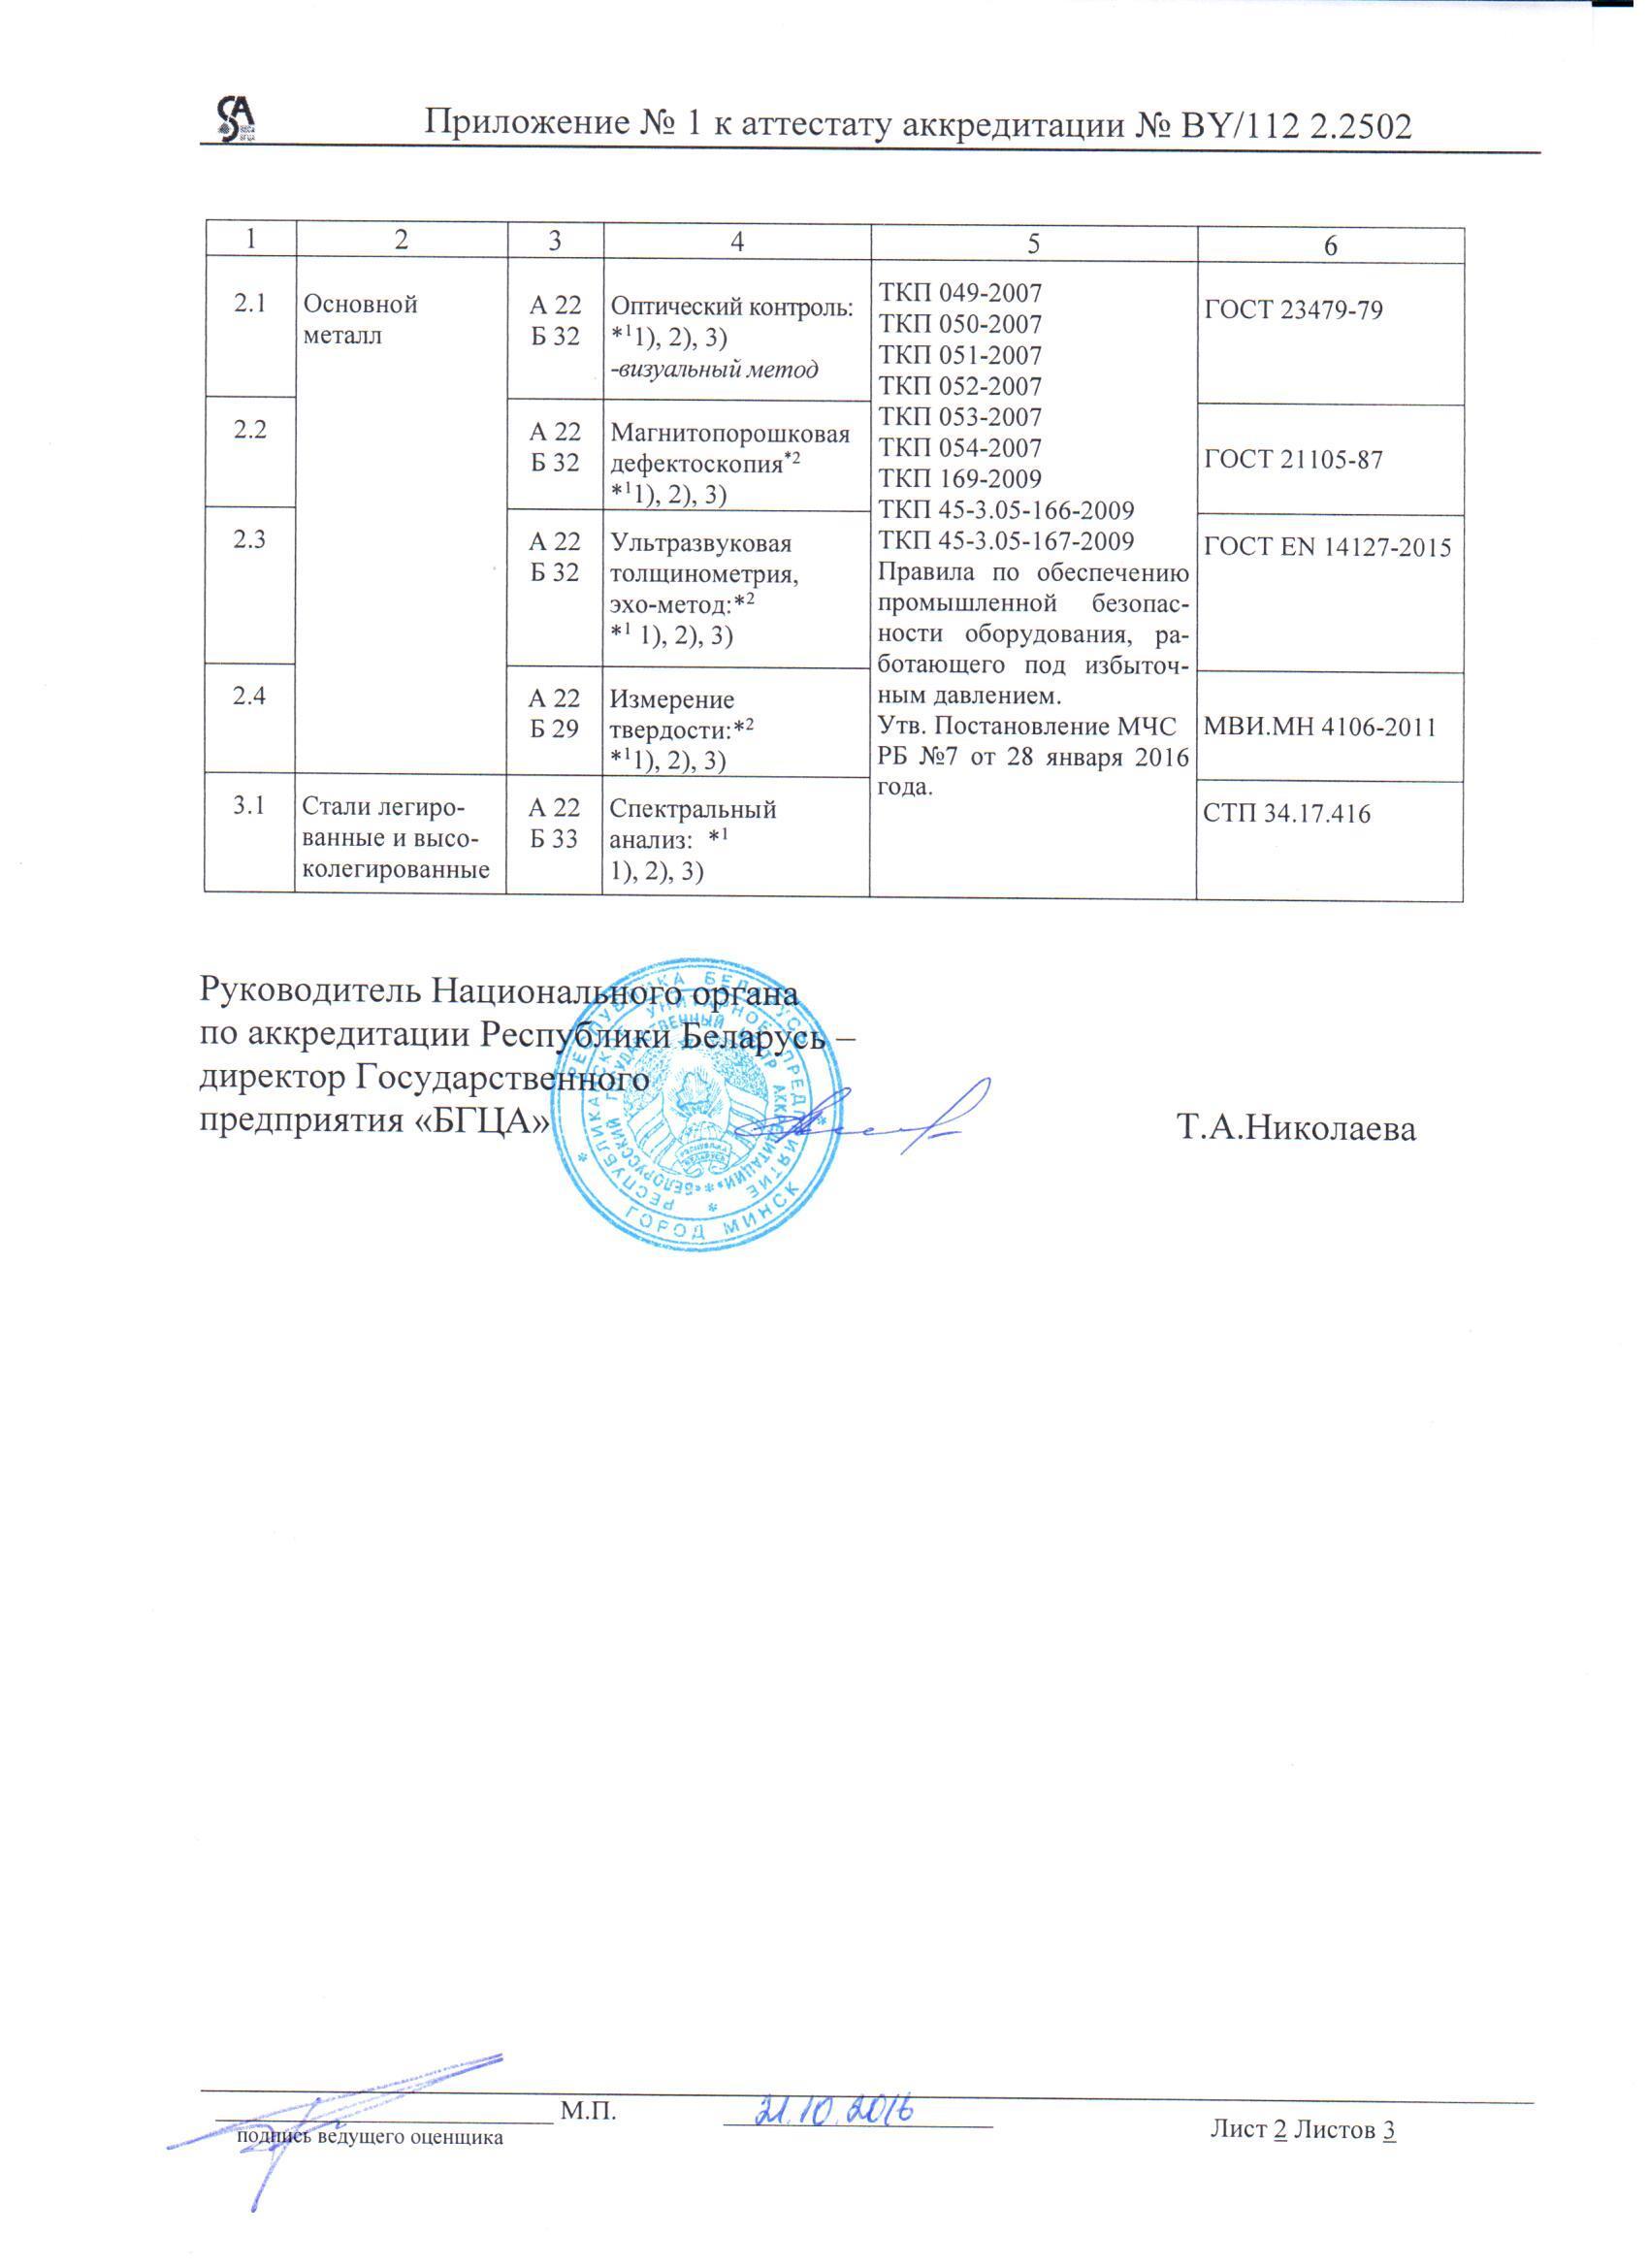 Обл. аккредитации ЛКМиС 02